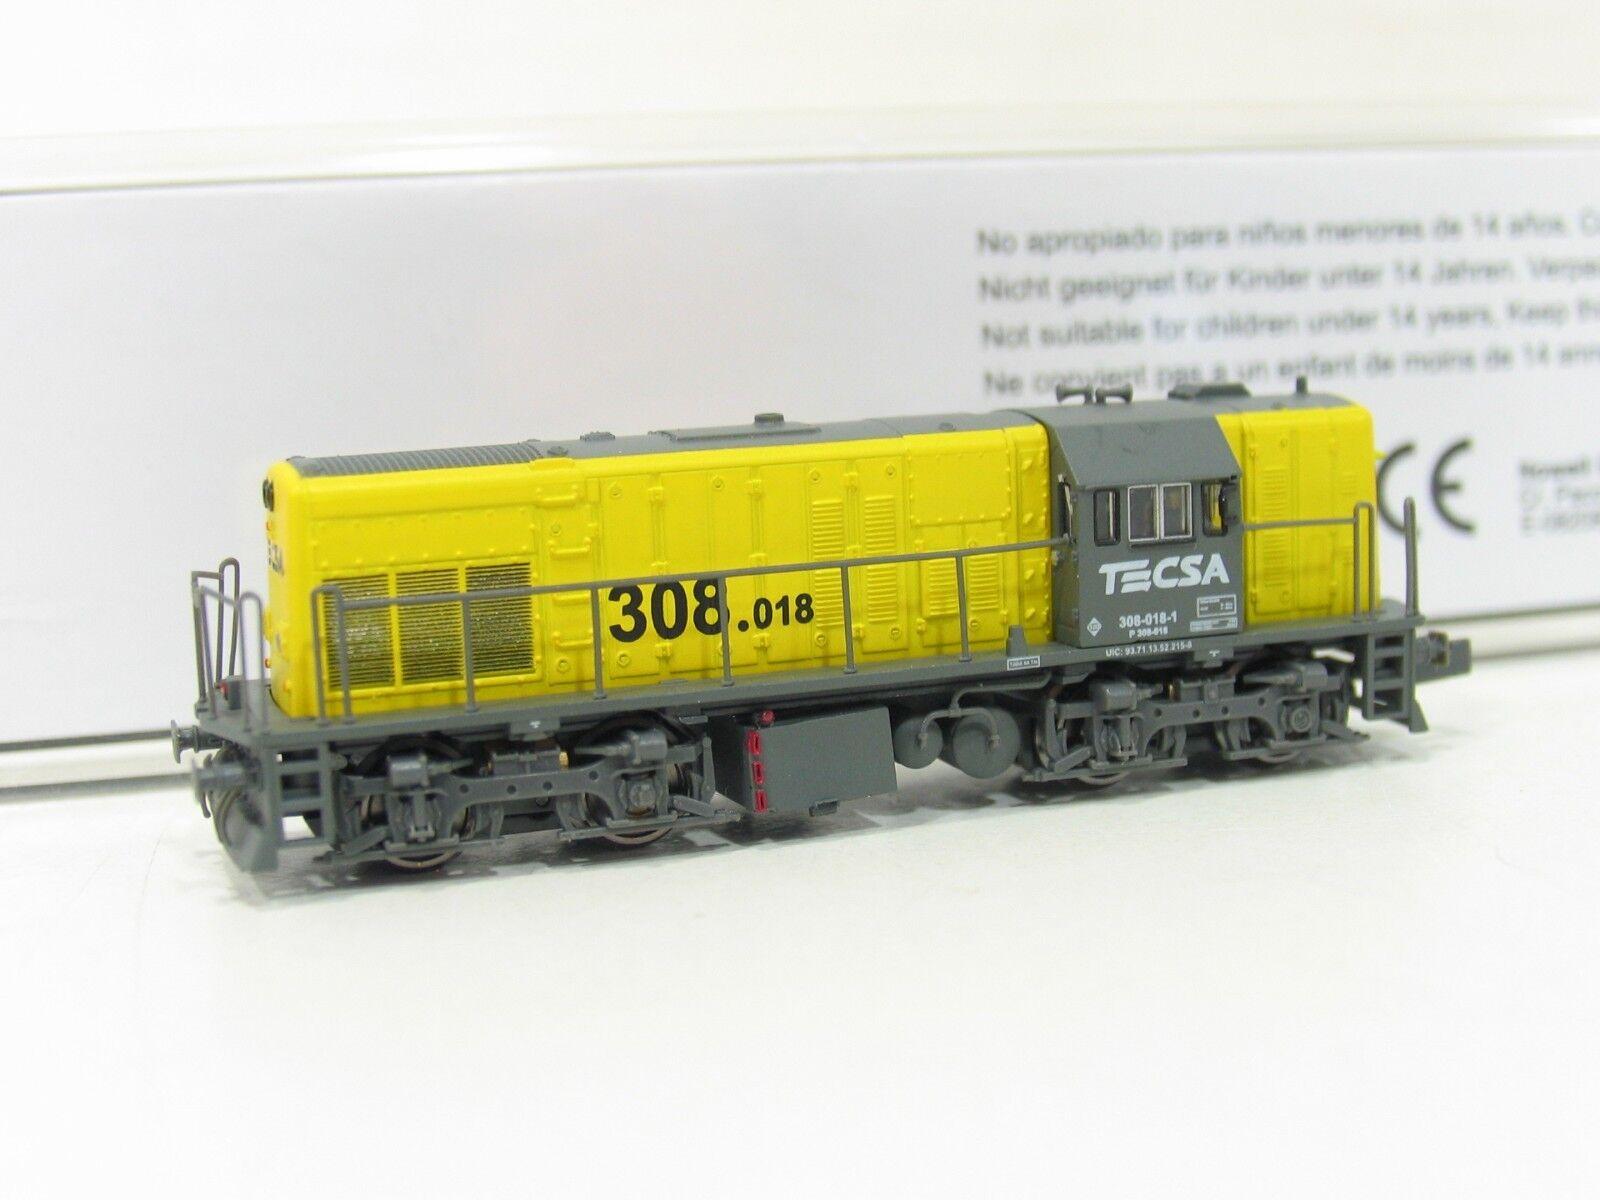 Start Rain 60917 Diesellok tecsa 308 Yellow Grey the RENFE sp1110